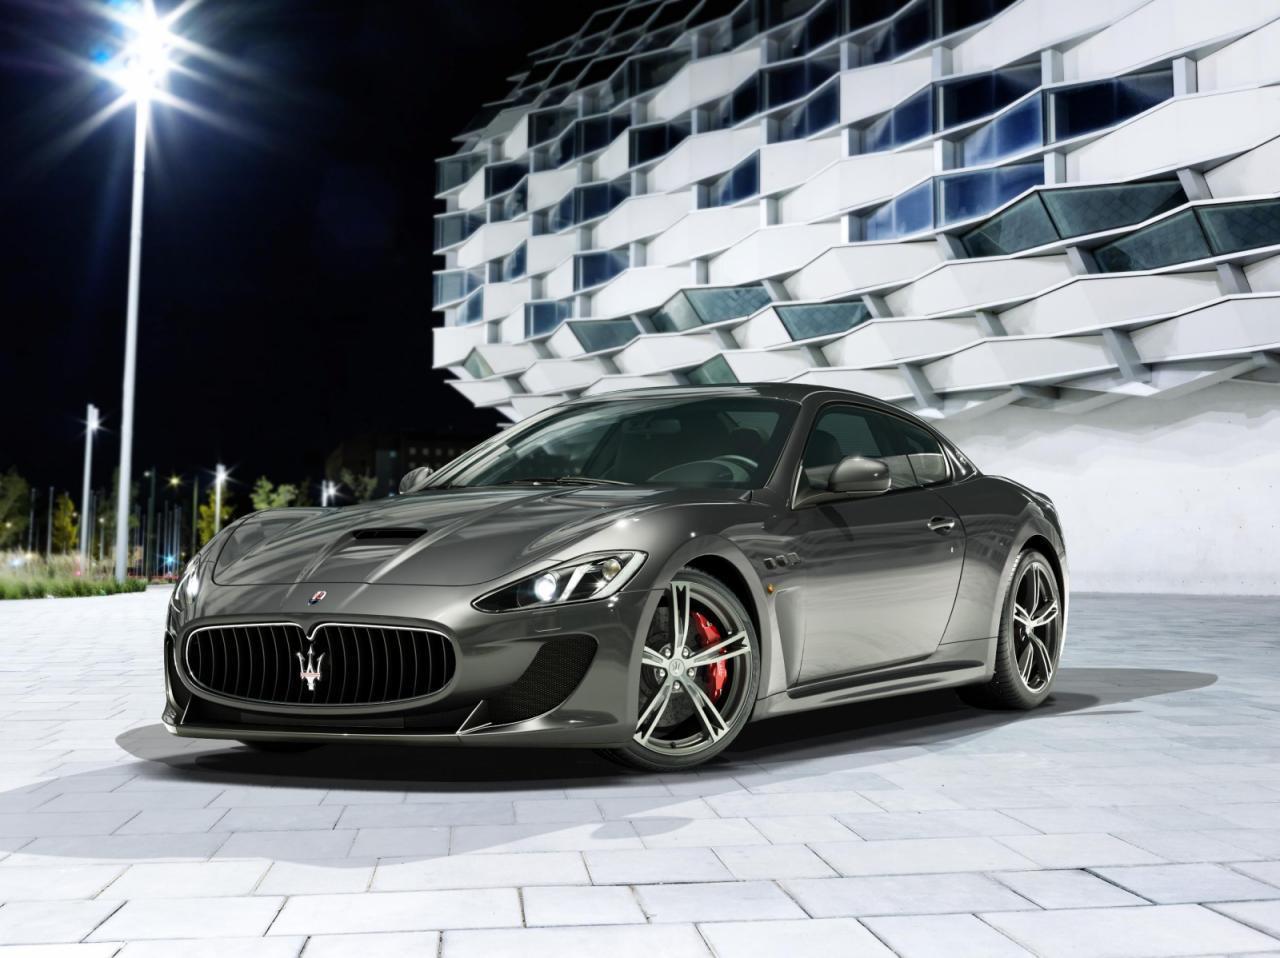 [Resim: Maserati+GranTurismo+MC+Stradale+2.jpg]